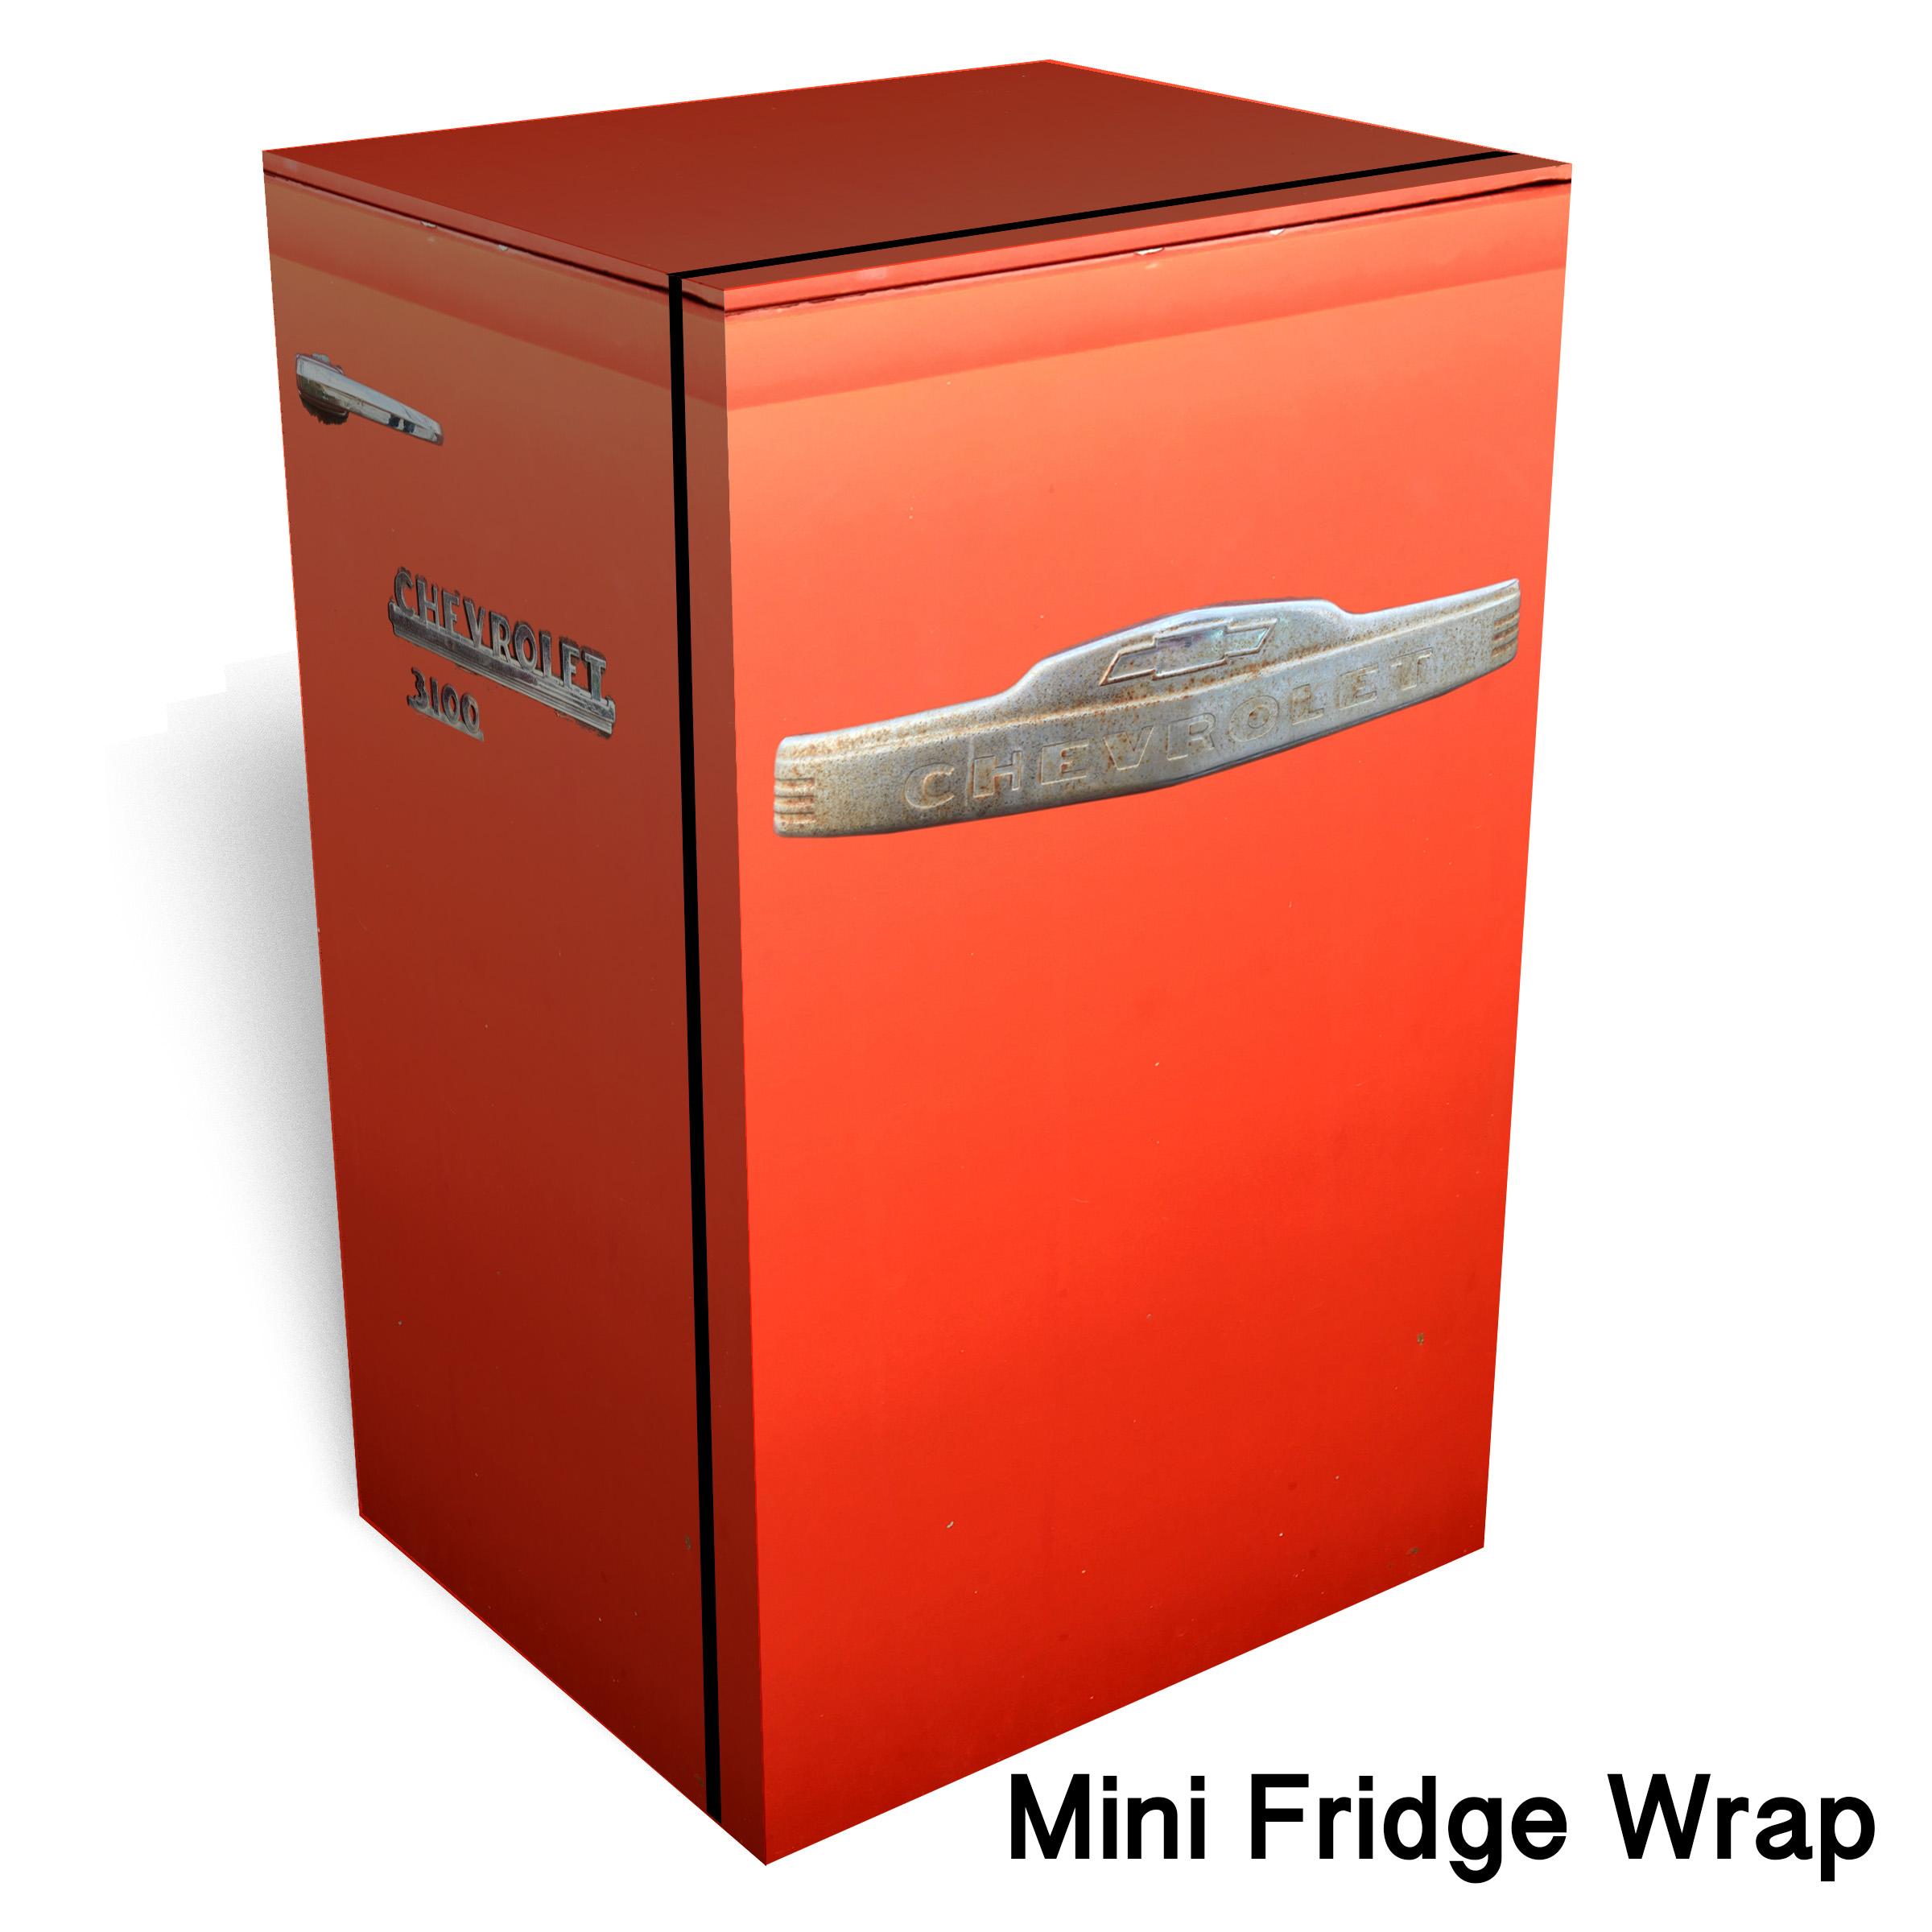 3100 Chevrolet Red Mini Fridge Skin